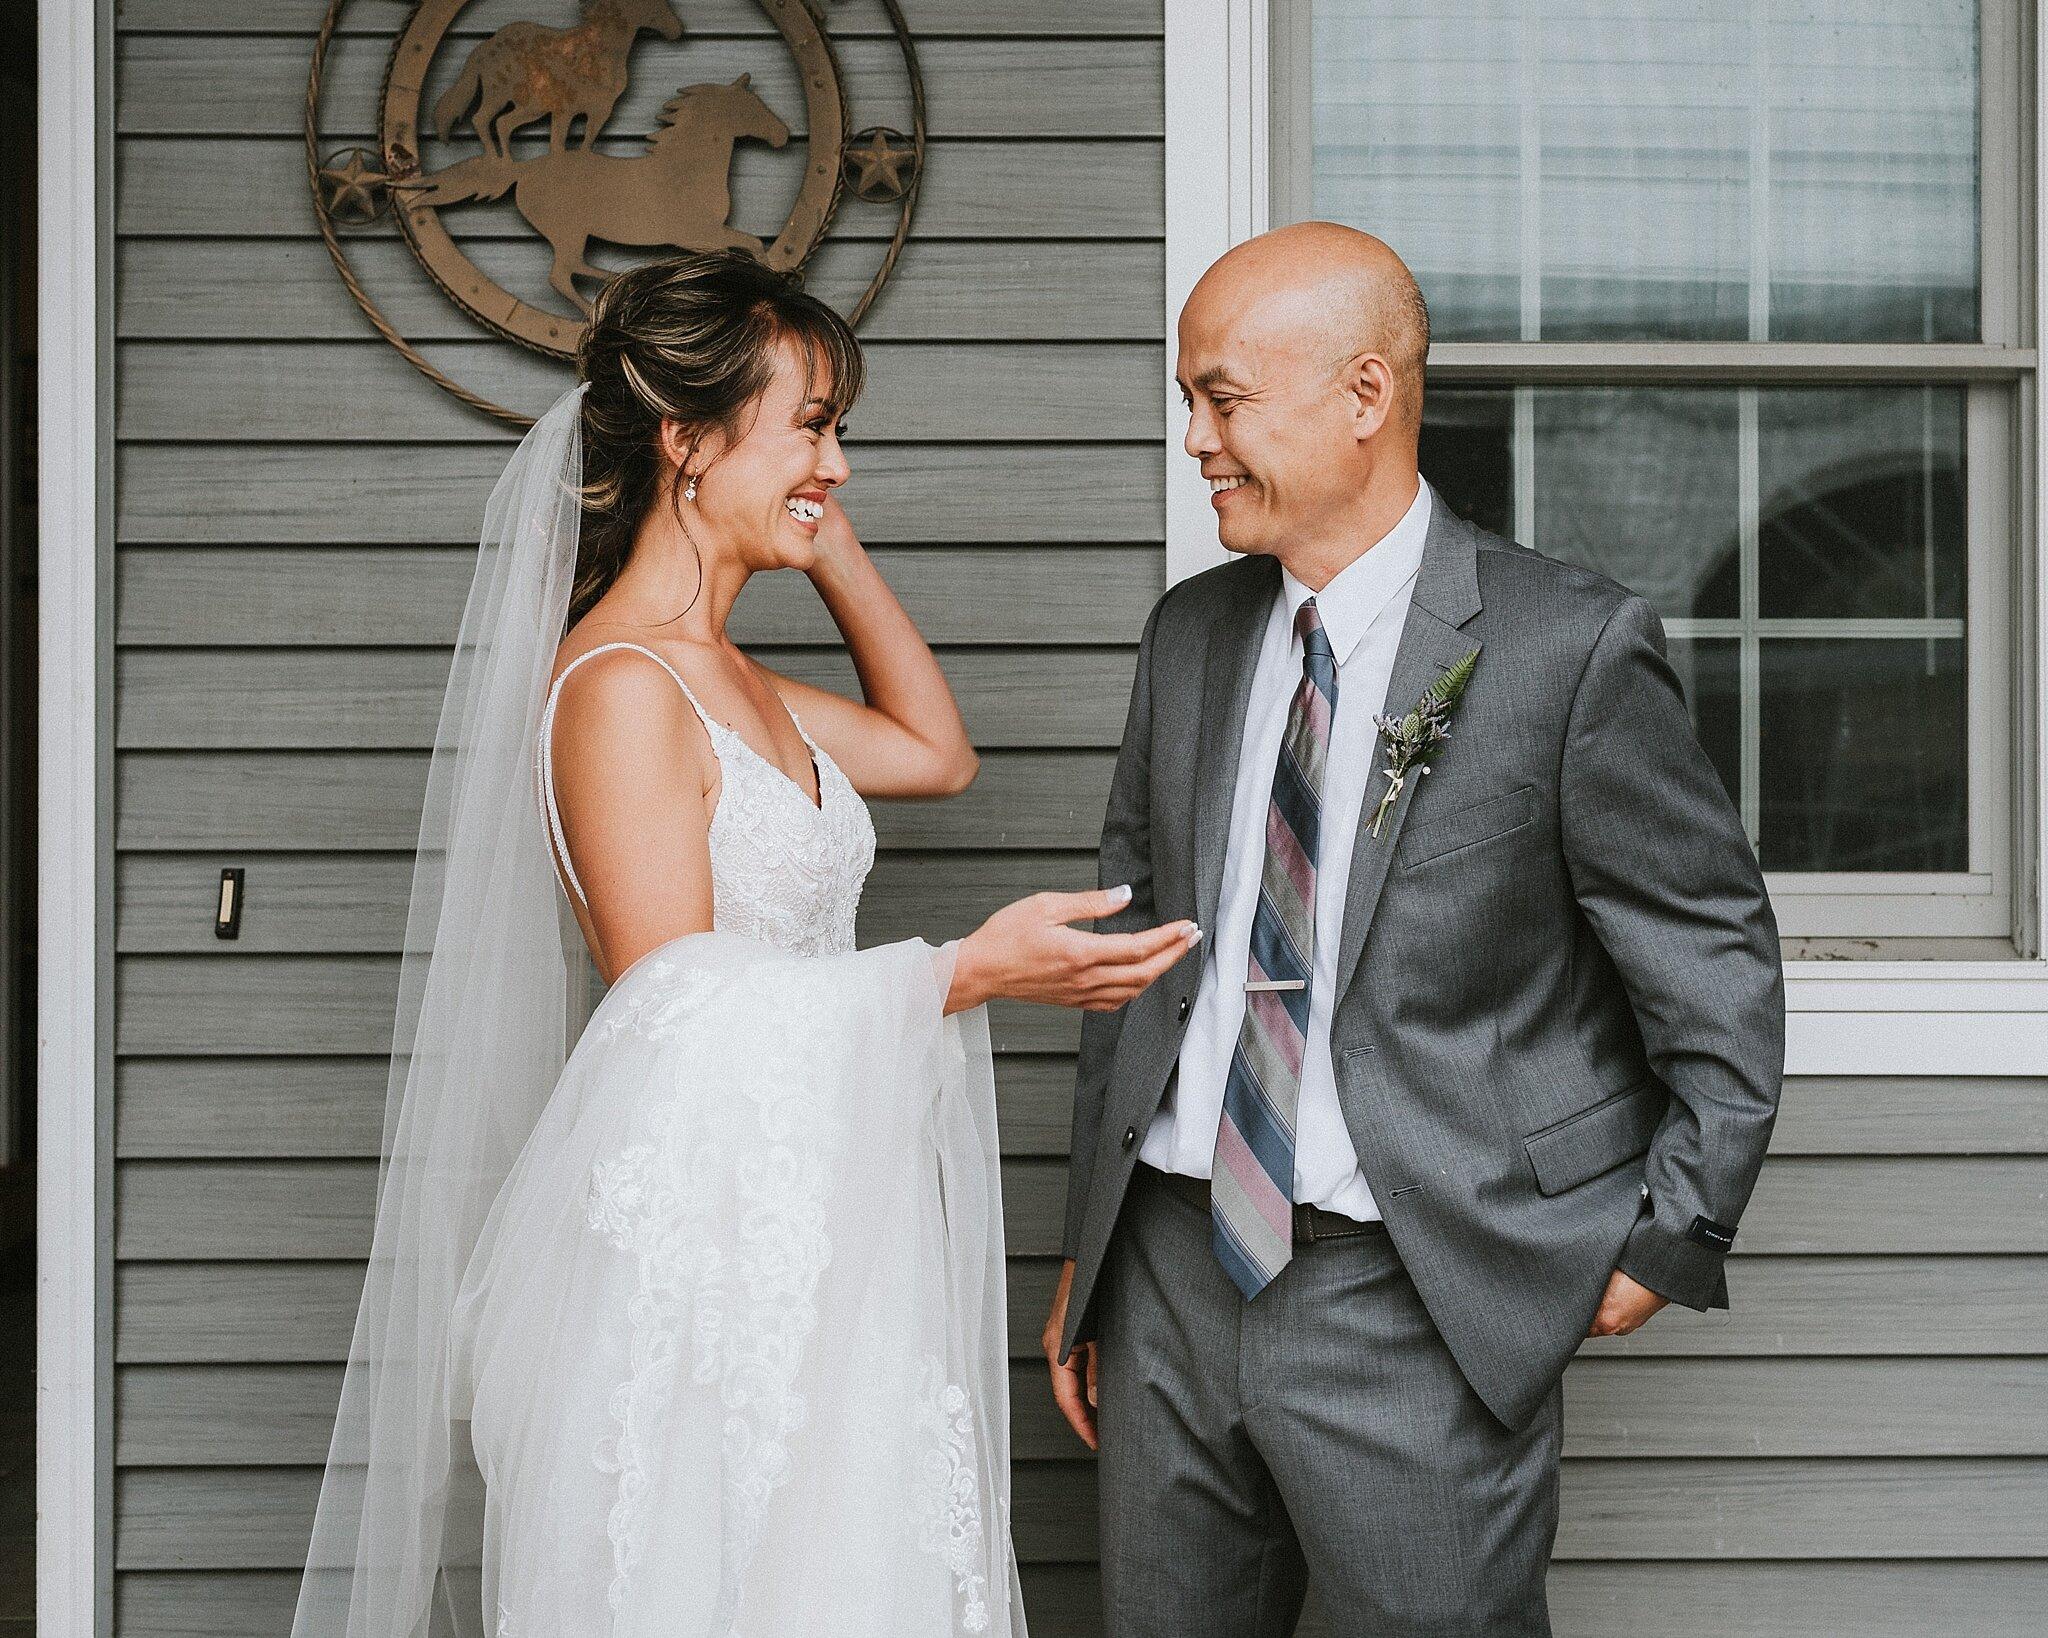 connecticut_wedding_3013.jpg